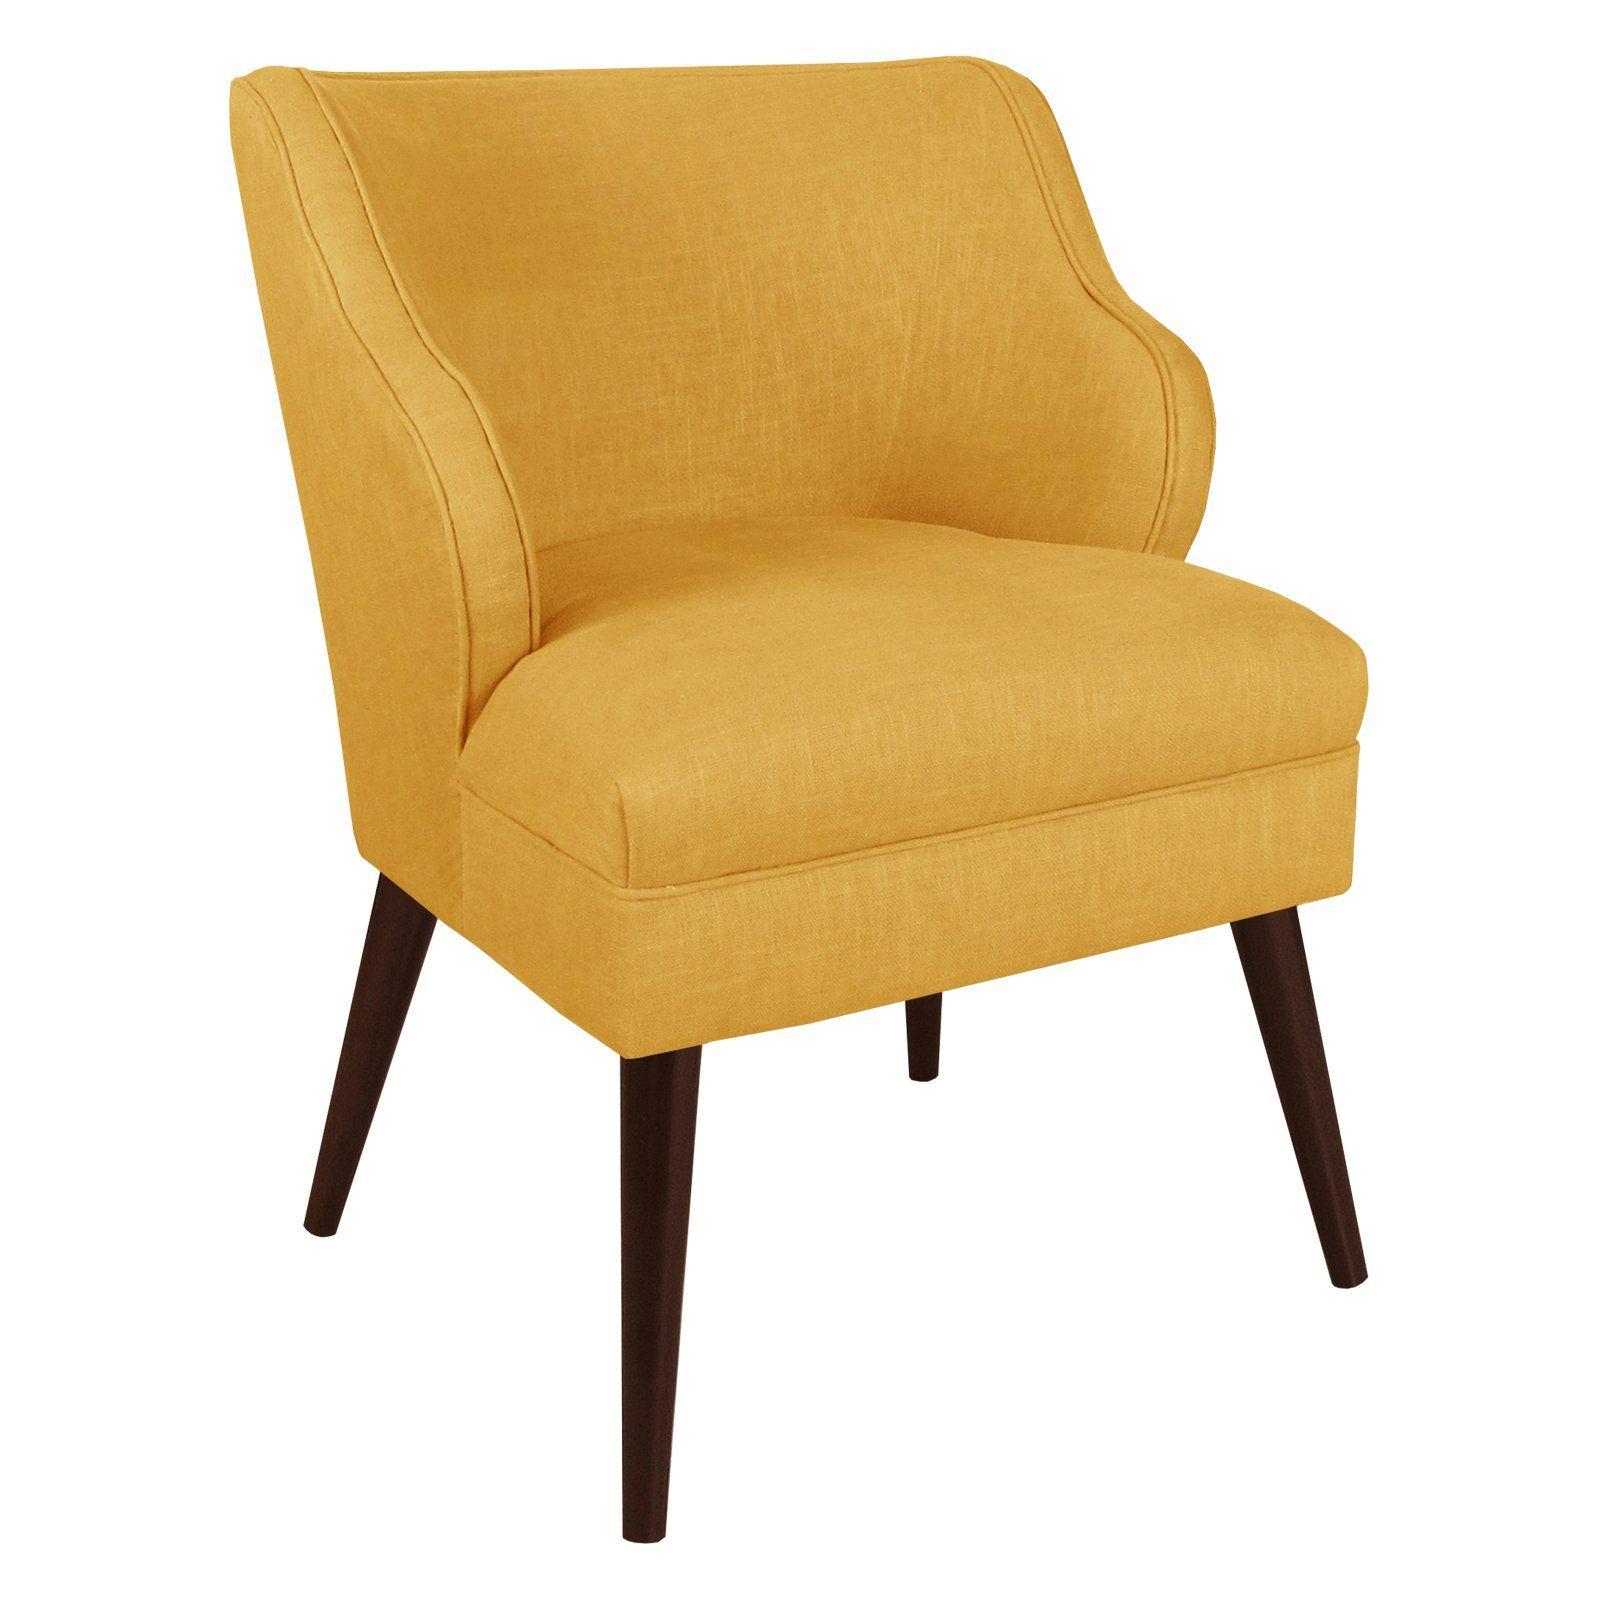 Skyline Furniture Modern Chair Linen French Yellow Modern Chairs